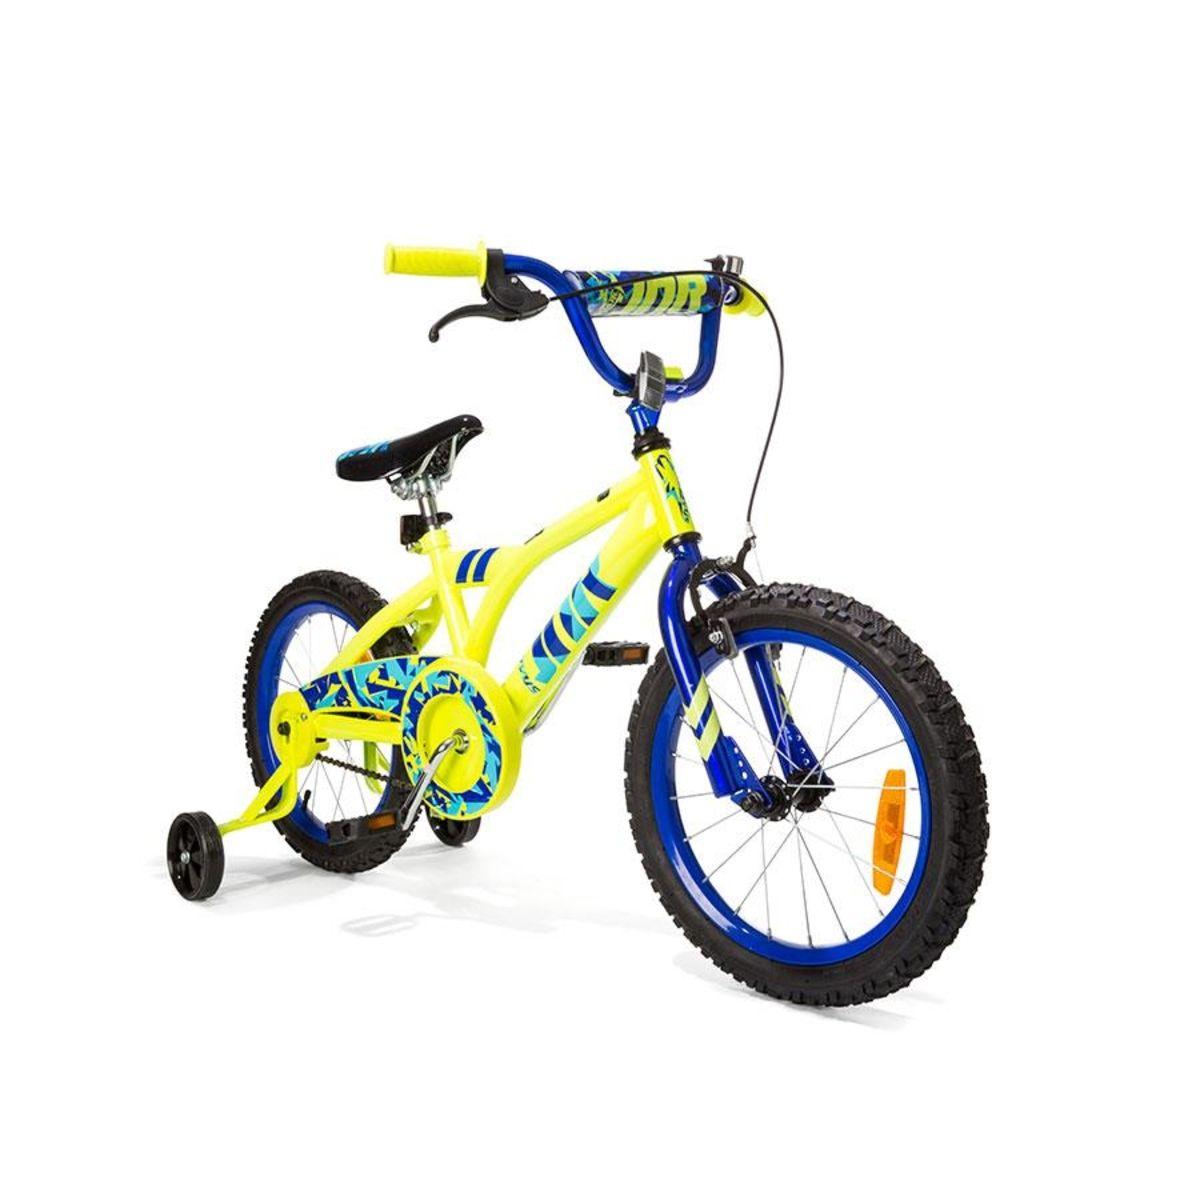 40cm Snarl Jnr Bike Southern Star Box 409 Bmx Bikes Bike Pump